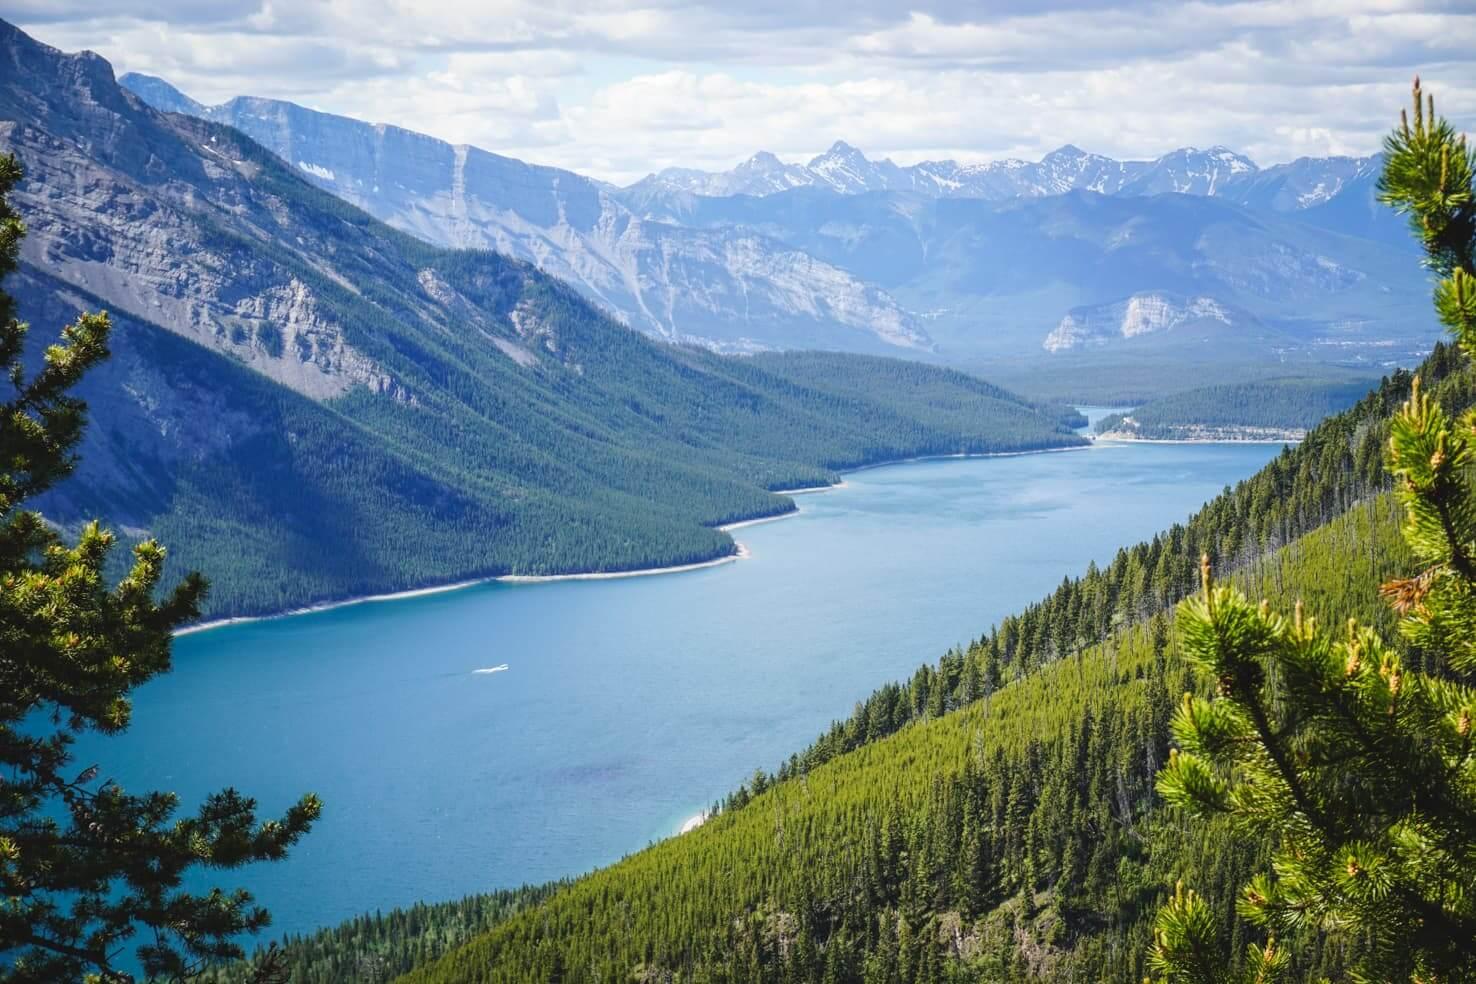 Canadian Rockies road trip itinerary - Lake Minnewanka in Banff National Park